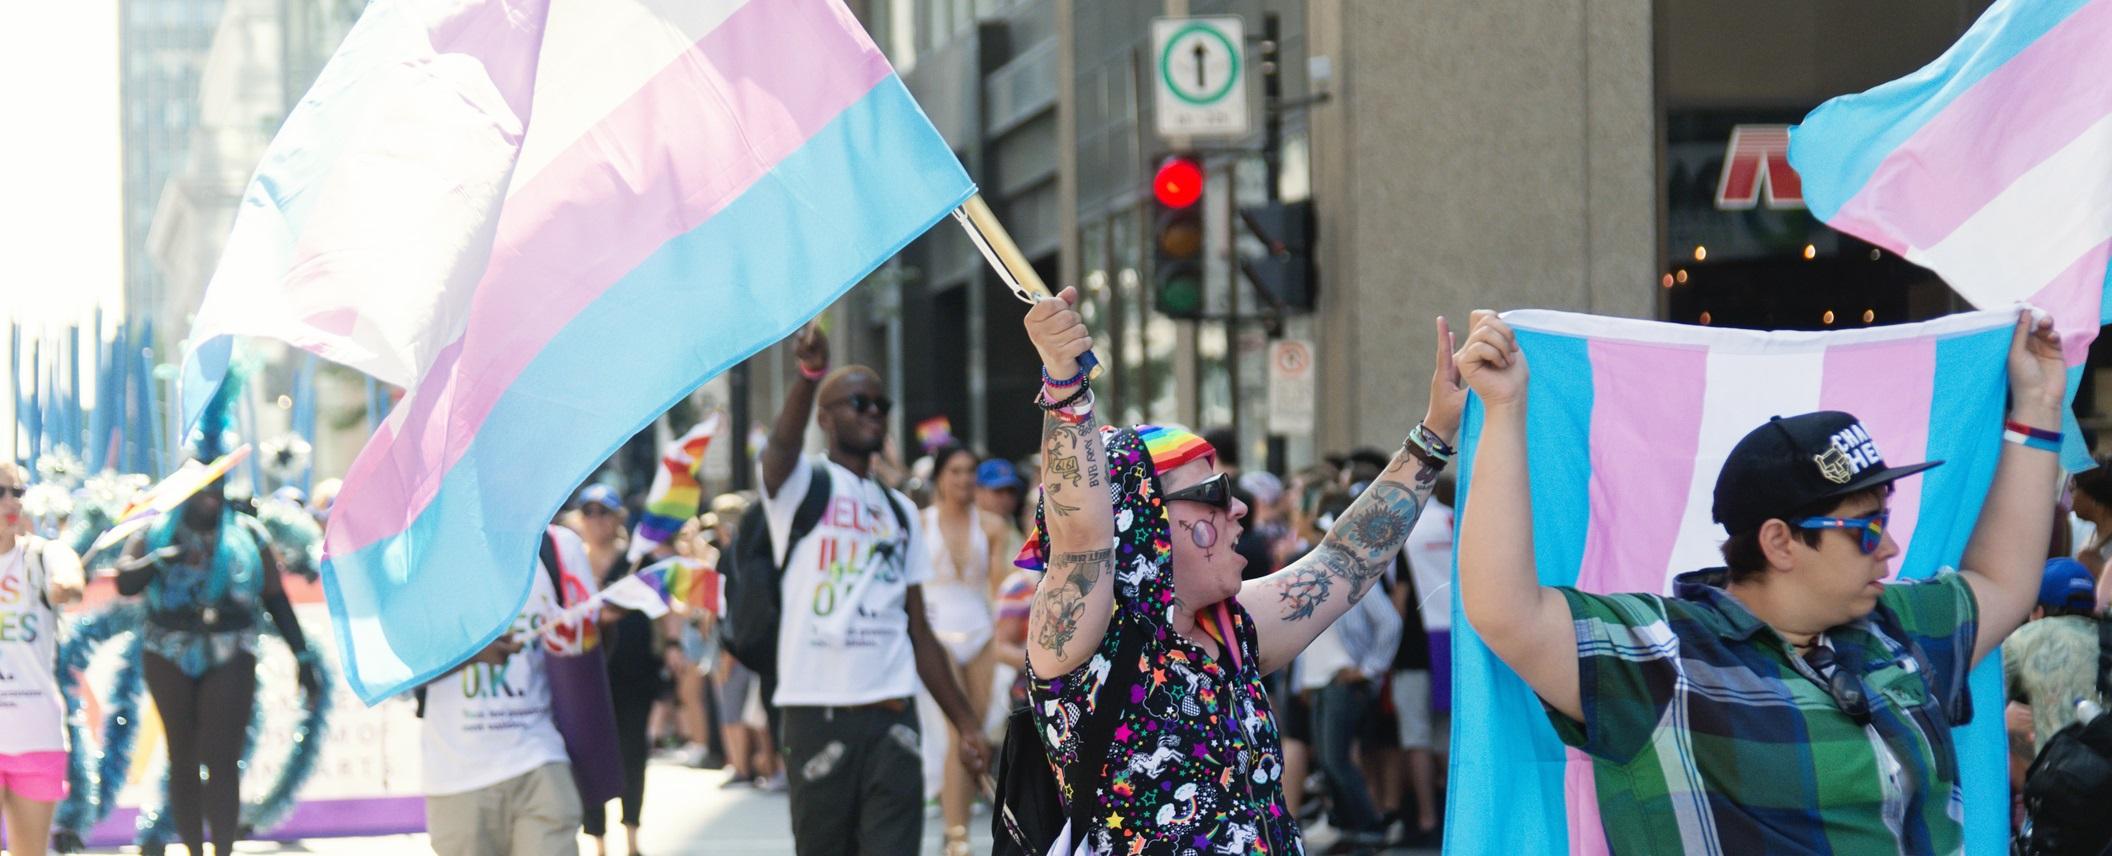 transgender_parade_cropped.jpg